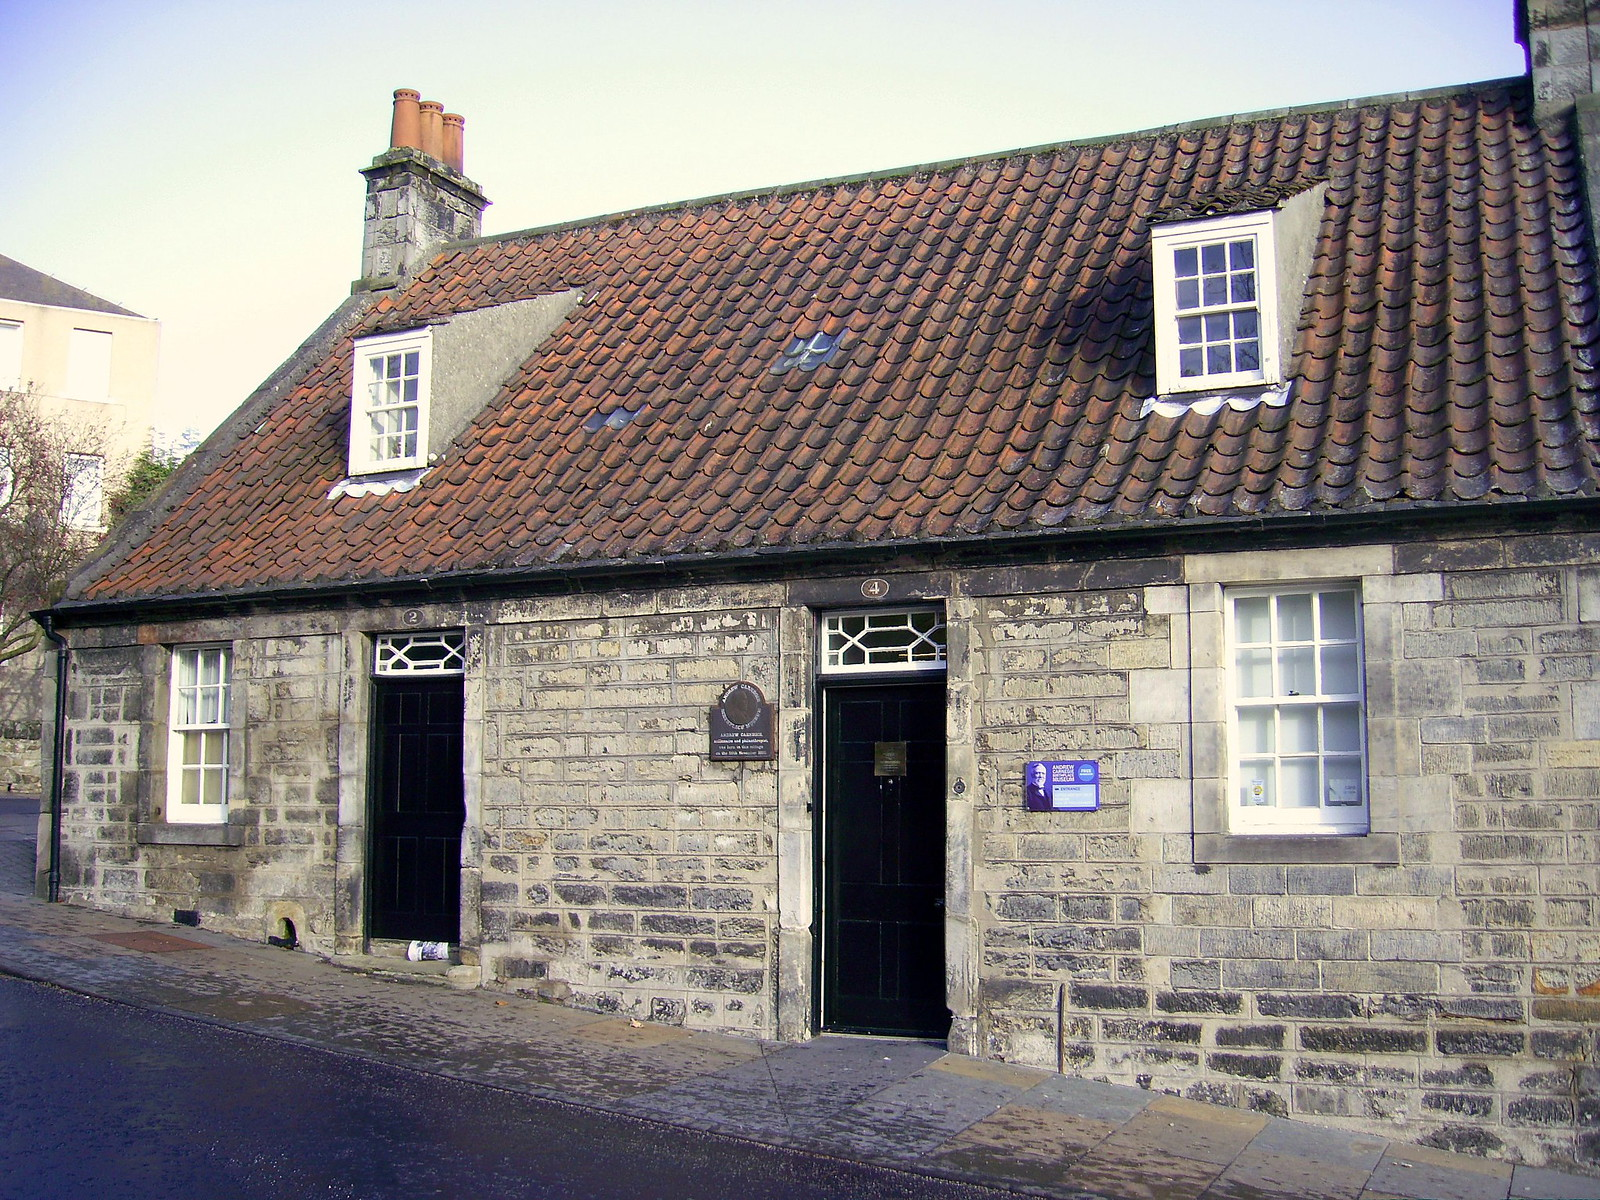 Andrew Carnegie's birthplace, 4 Moodie Street, Dunfermline, Fife, Scotland. Credit Kilnburn